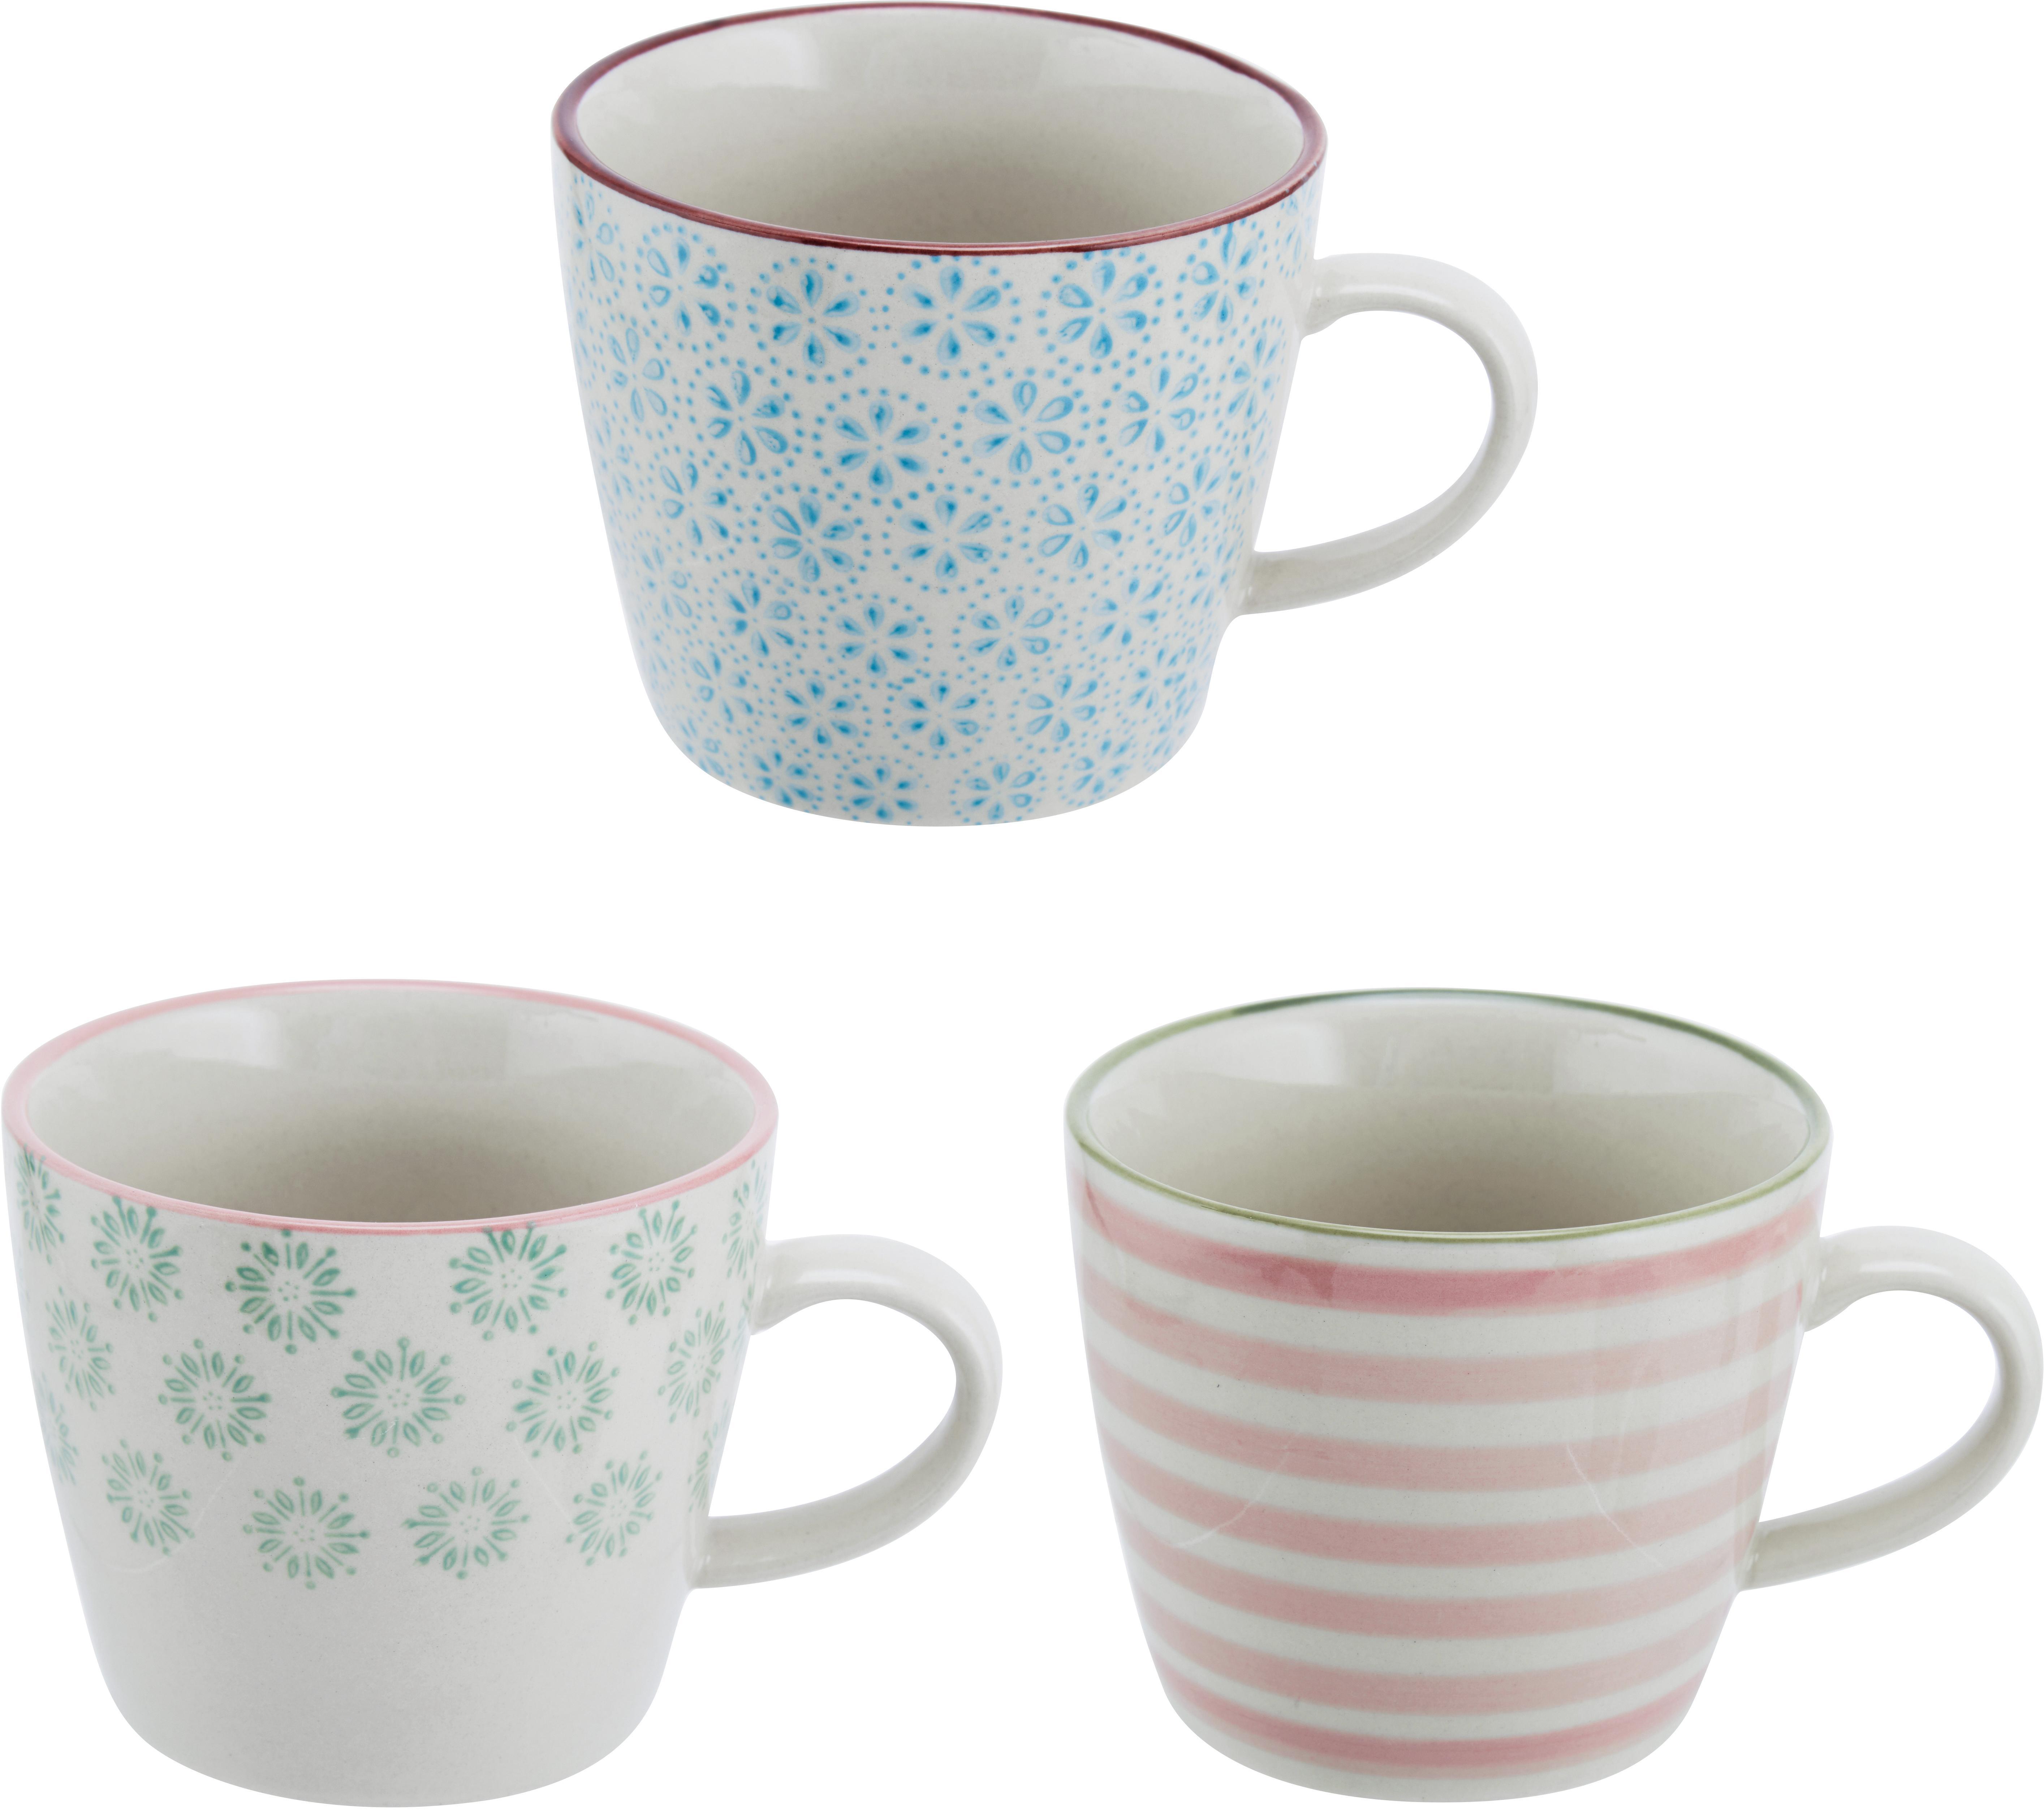 Set 3 tazze dipinte a mano Patrizia, Terracotta, Bianco, verde, blu, rosso, Ø 10 x Alt. 8 cm